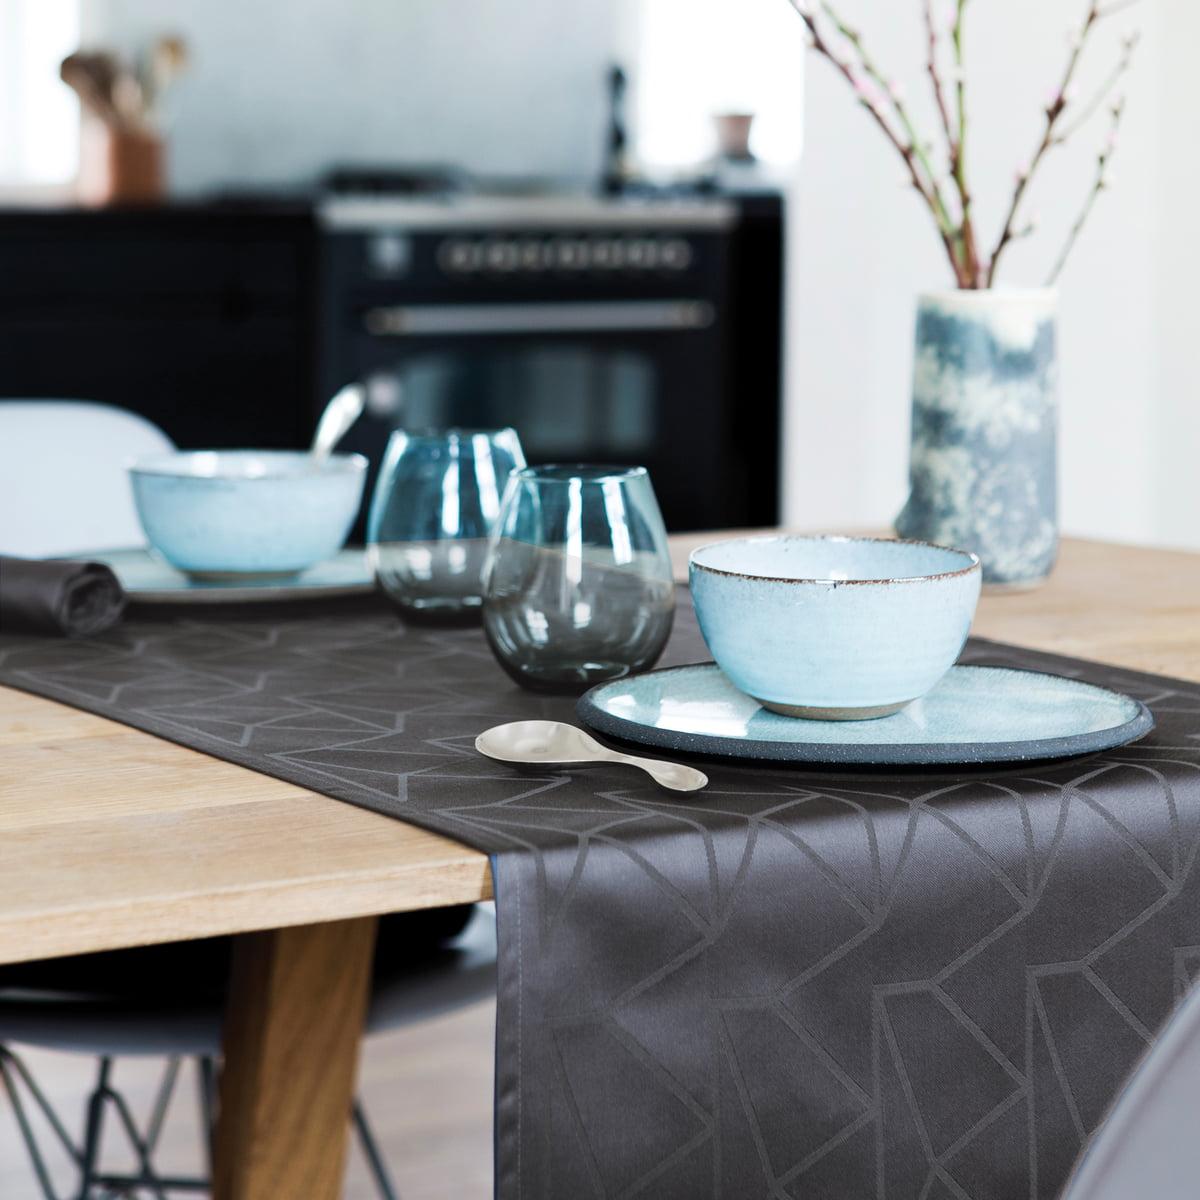 arne jacobsen tischl ufer von georg jensen damask. Black Bedroom Furniture Sets. Home Design Ideas